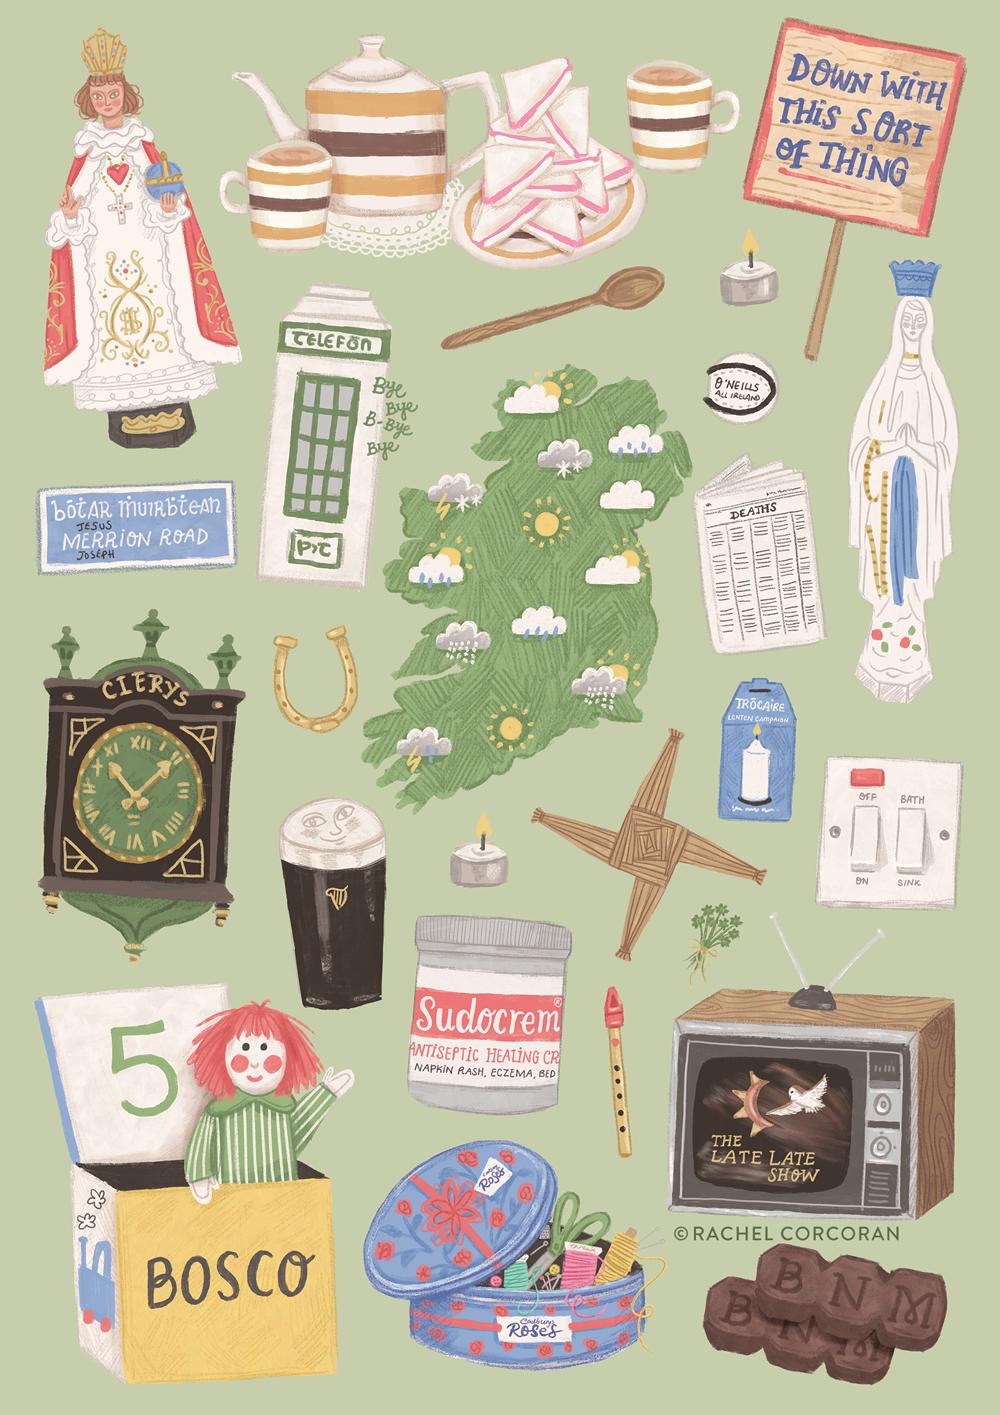 Home Sweet Home Irish illustration by Rachel Corcoran